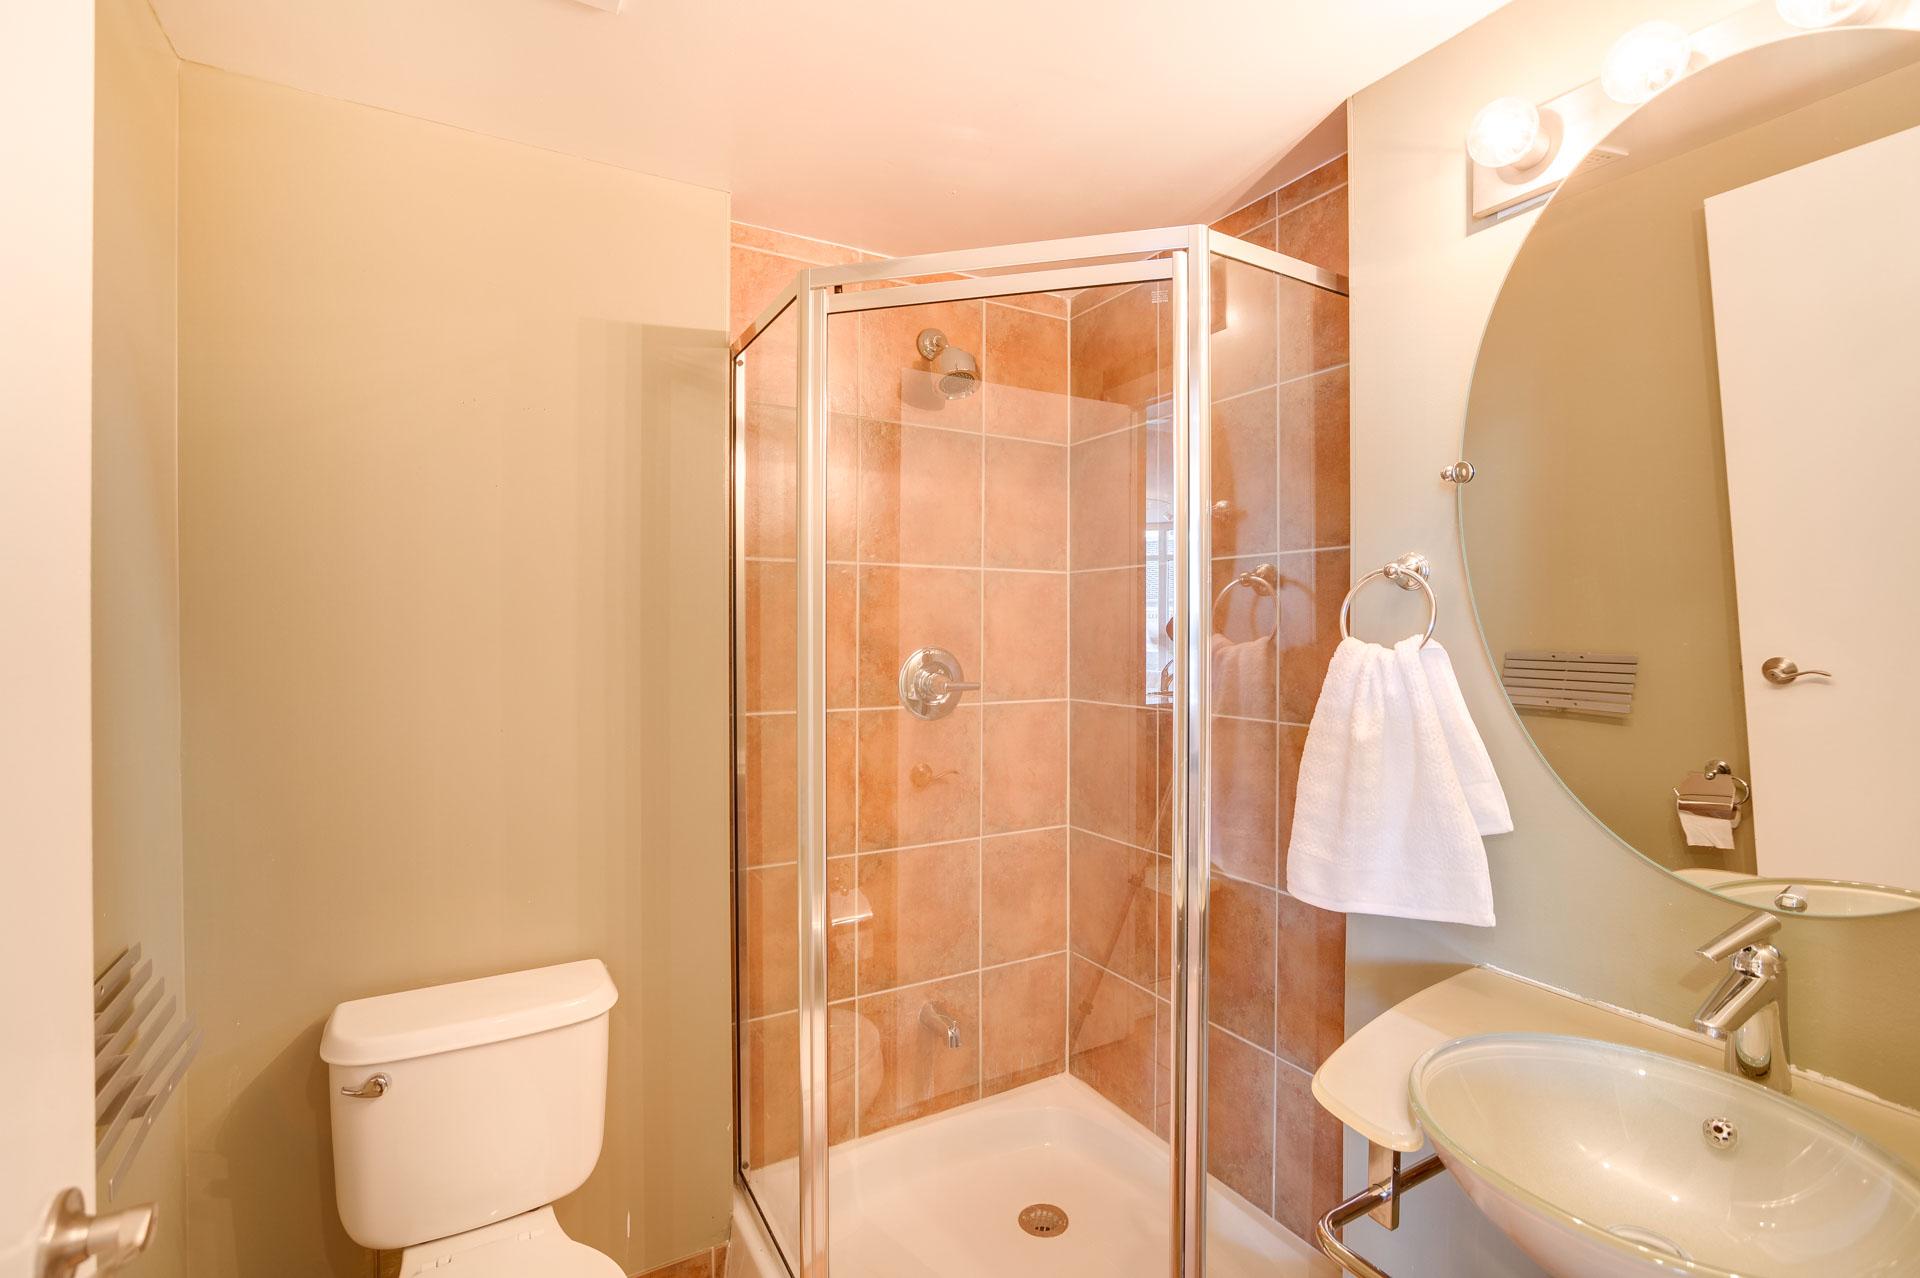 23_1stbathroom11.jpg